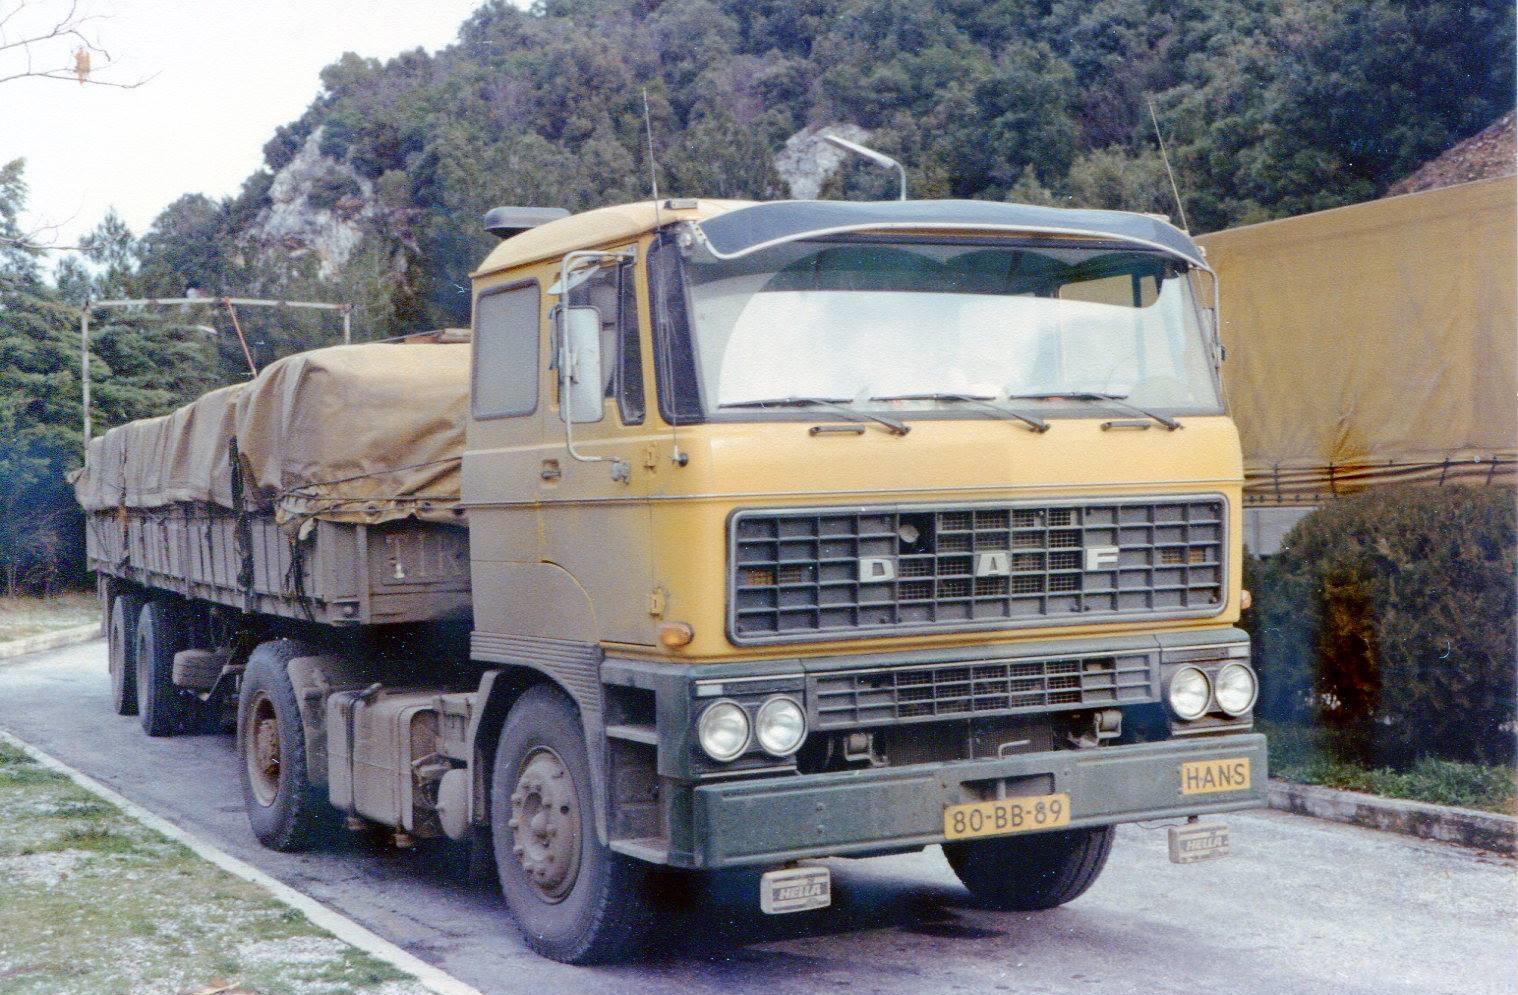 Hans-Anthonise-midden-oosten-transport-27